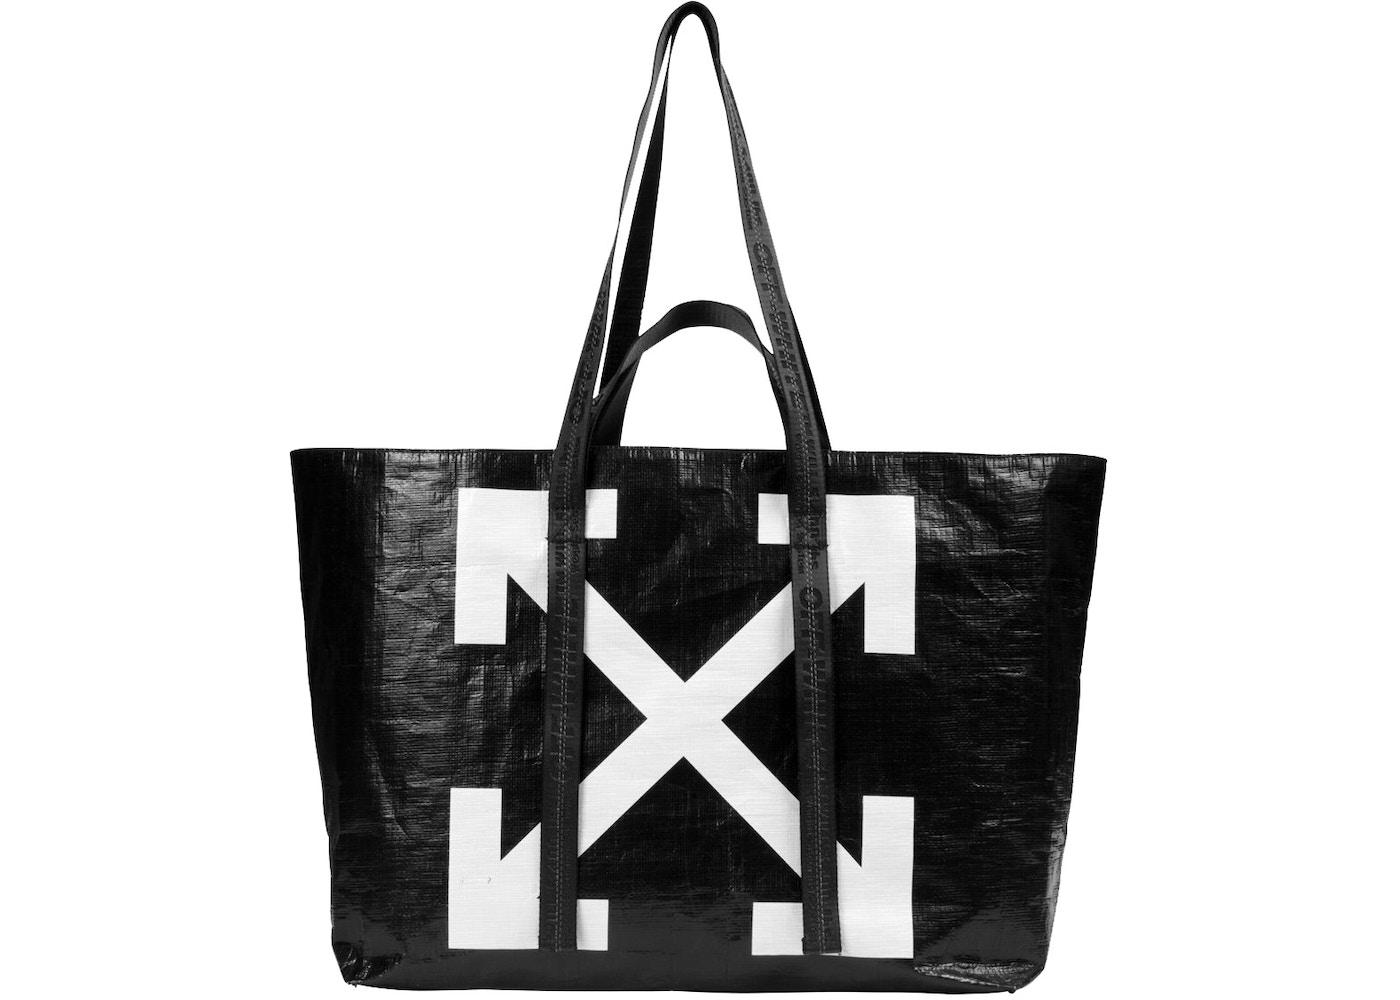 hot-seeling original modern and elegant in fashion elegant in style OFF-WHITE Arrows Tote Bag Black White